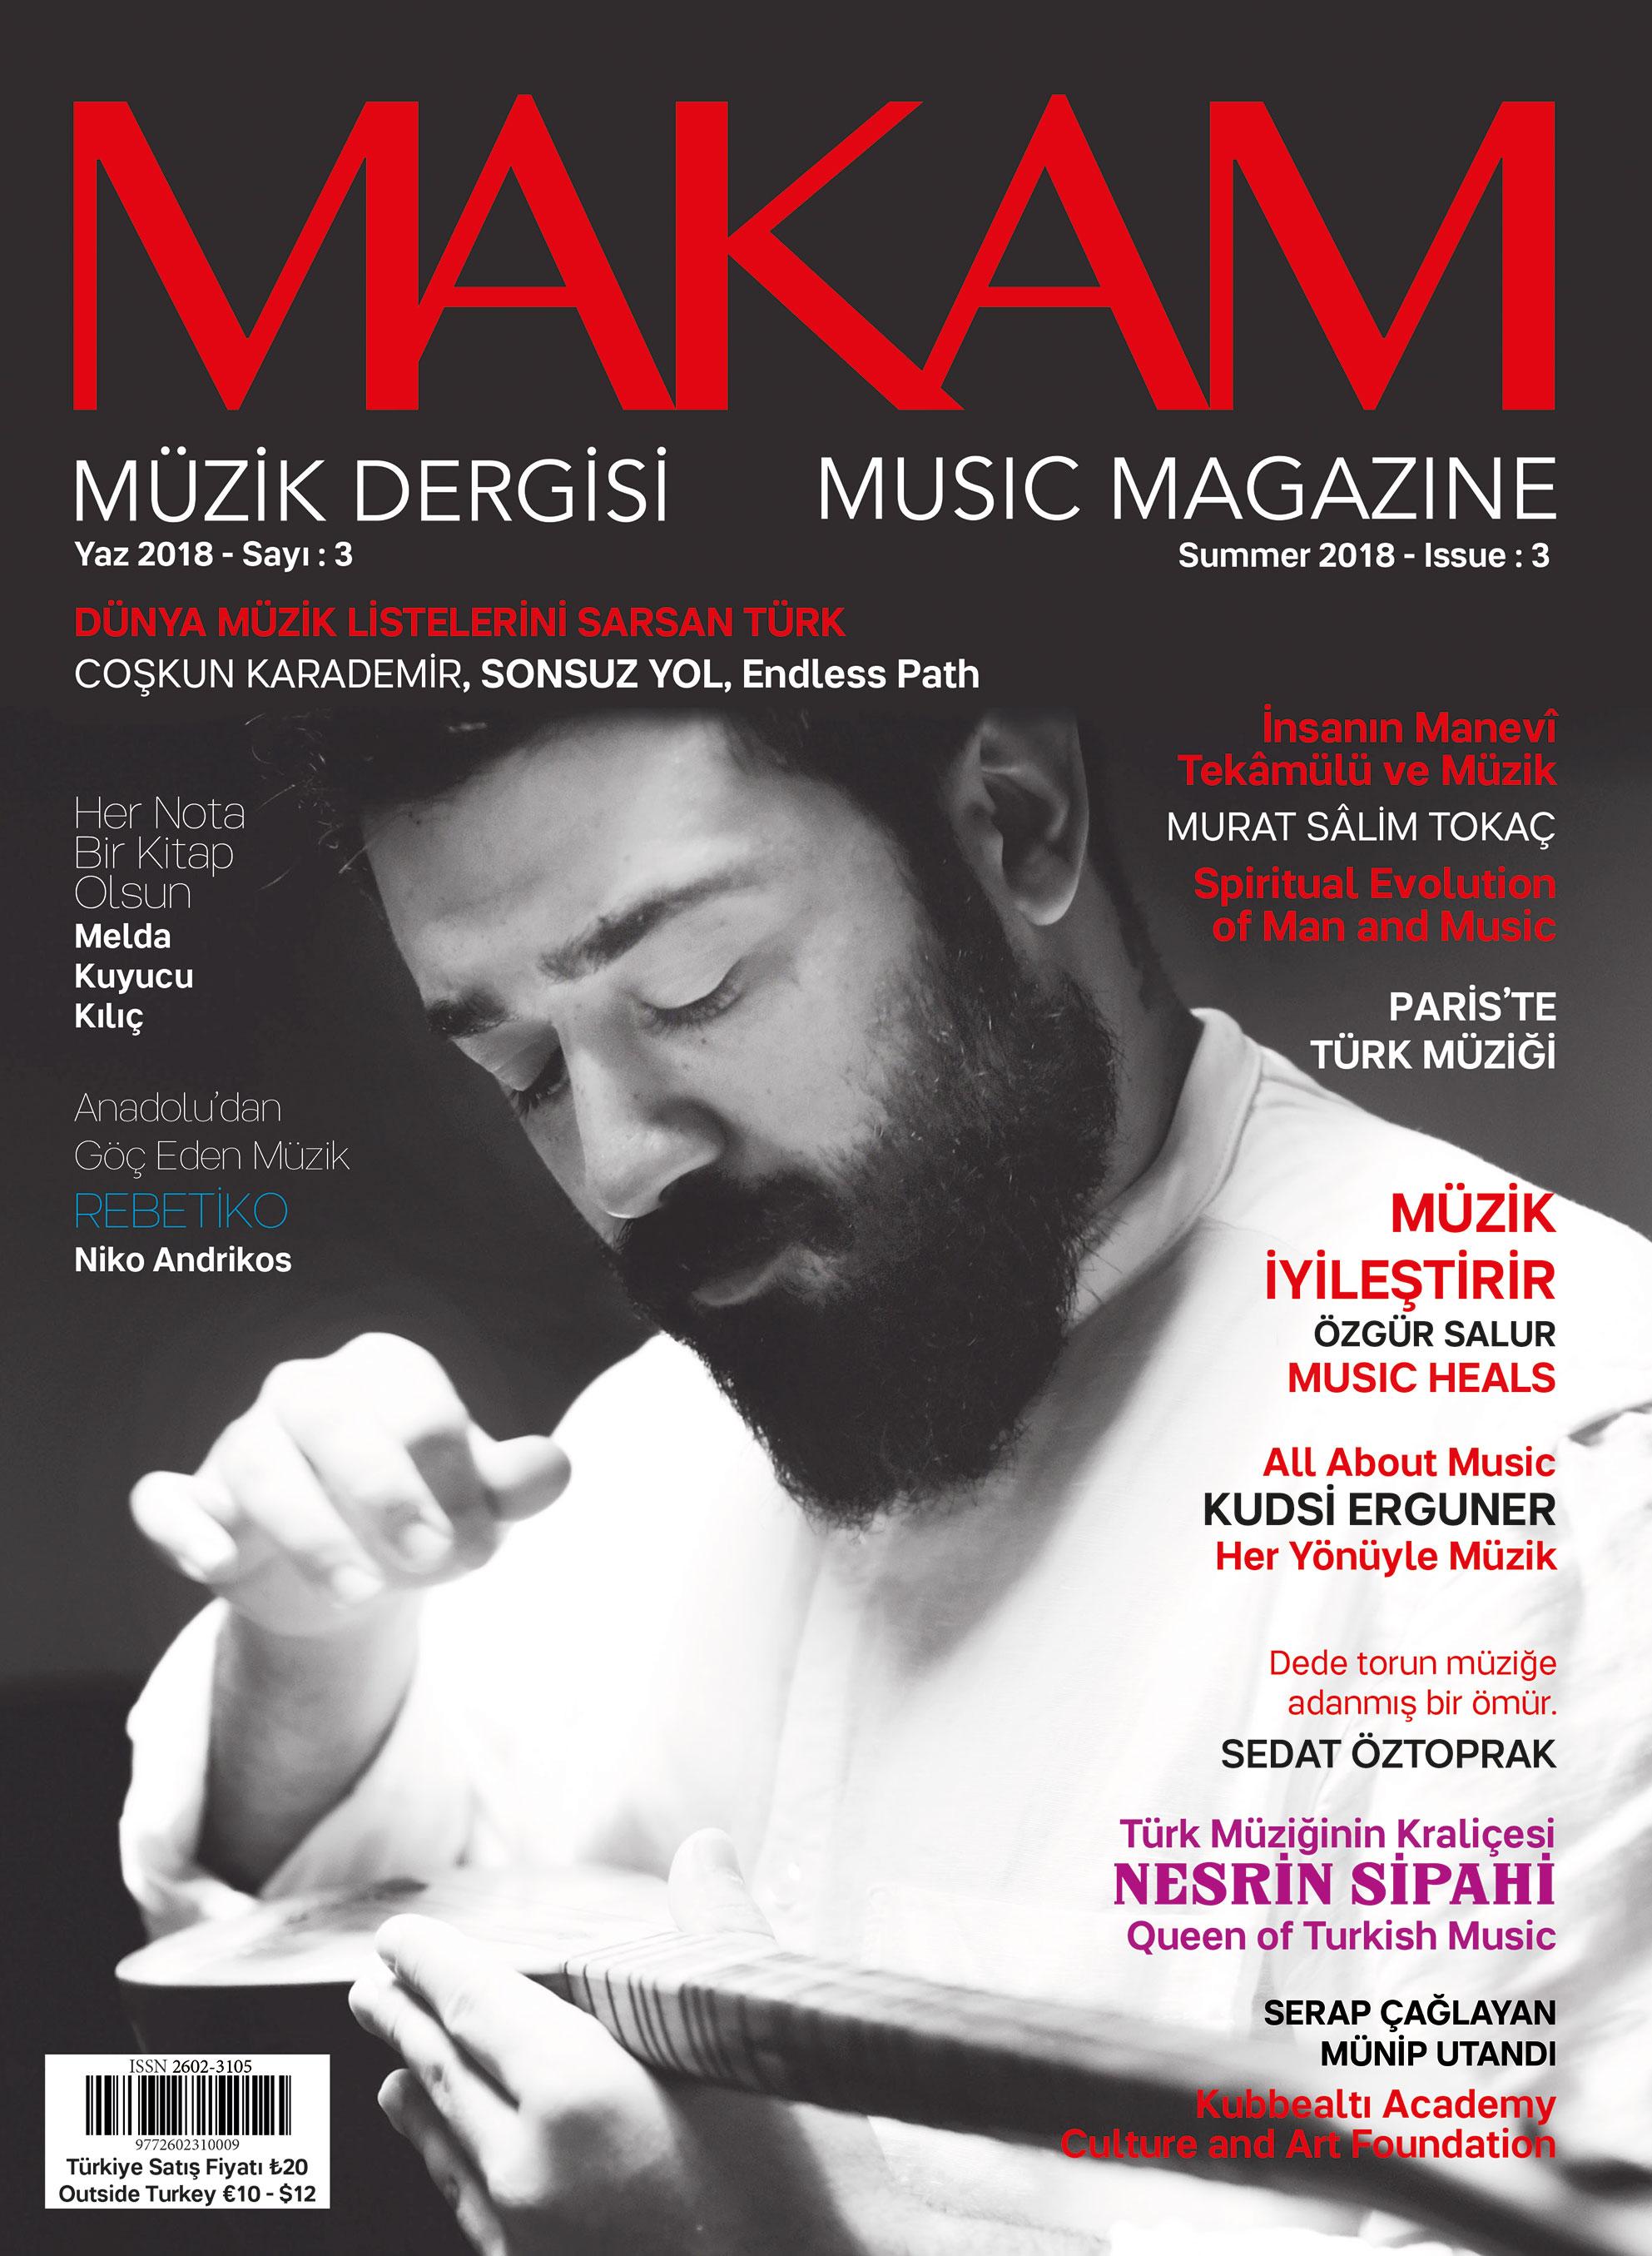 Makam Music